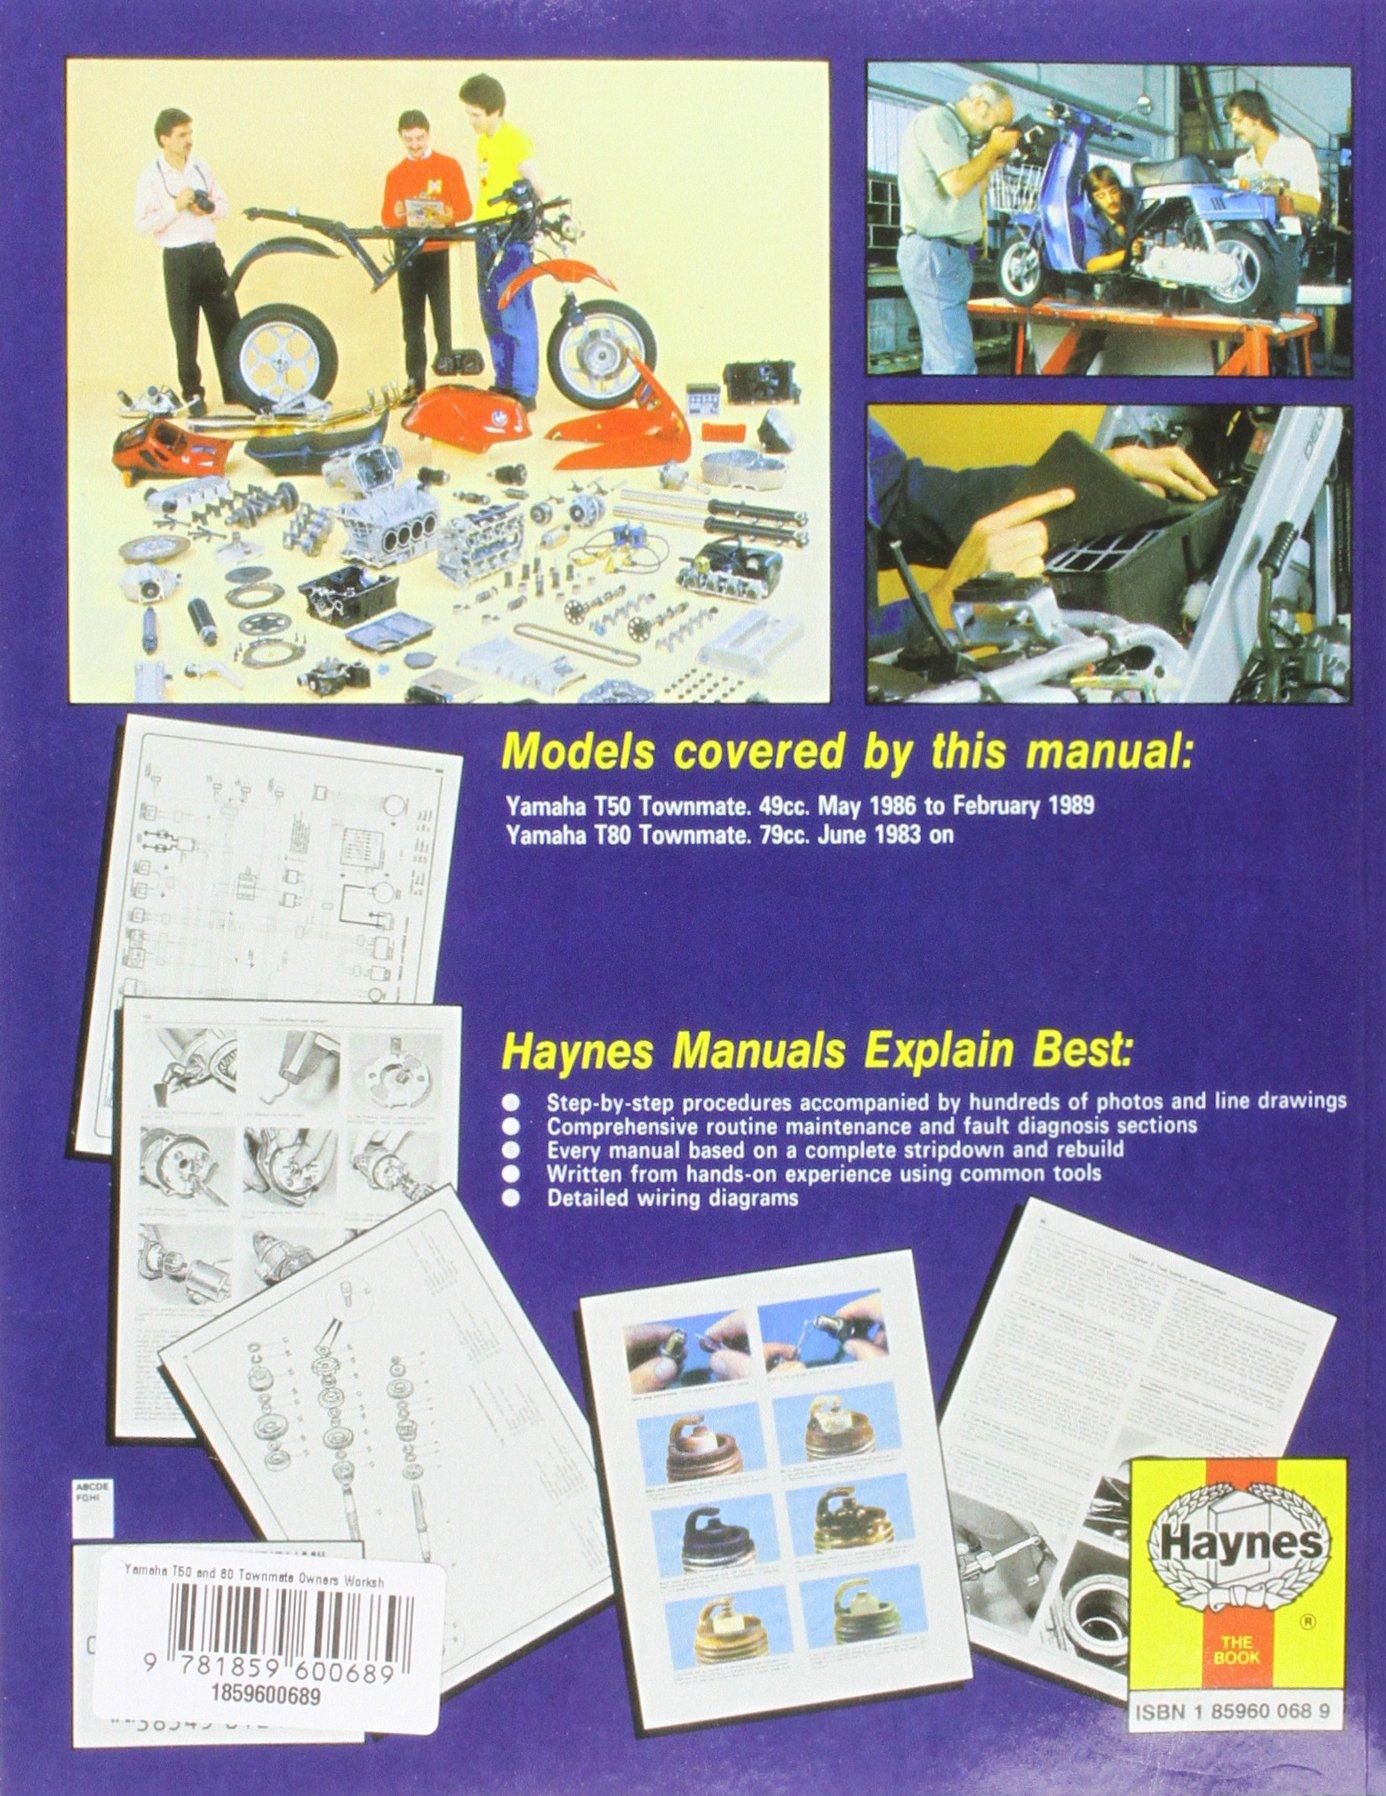 Yamaha T50 & 80 Townmate (Motorcycle Manuals) (Haynes Owners Workshop  Manuals): Pete Shoemark: 9781859600689: Amazon.com: Books